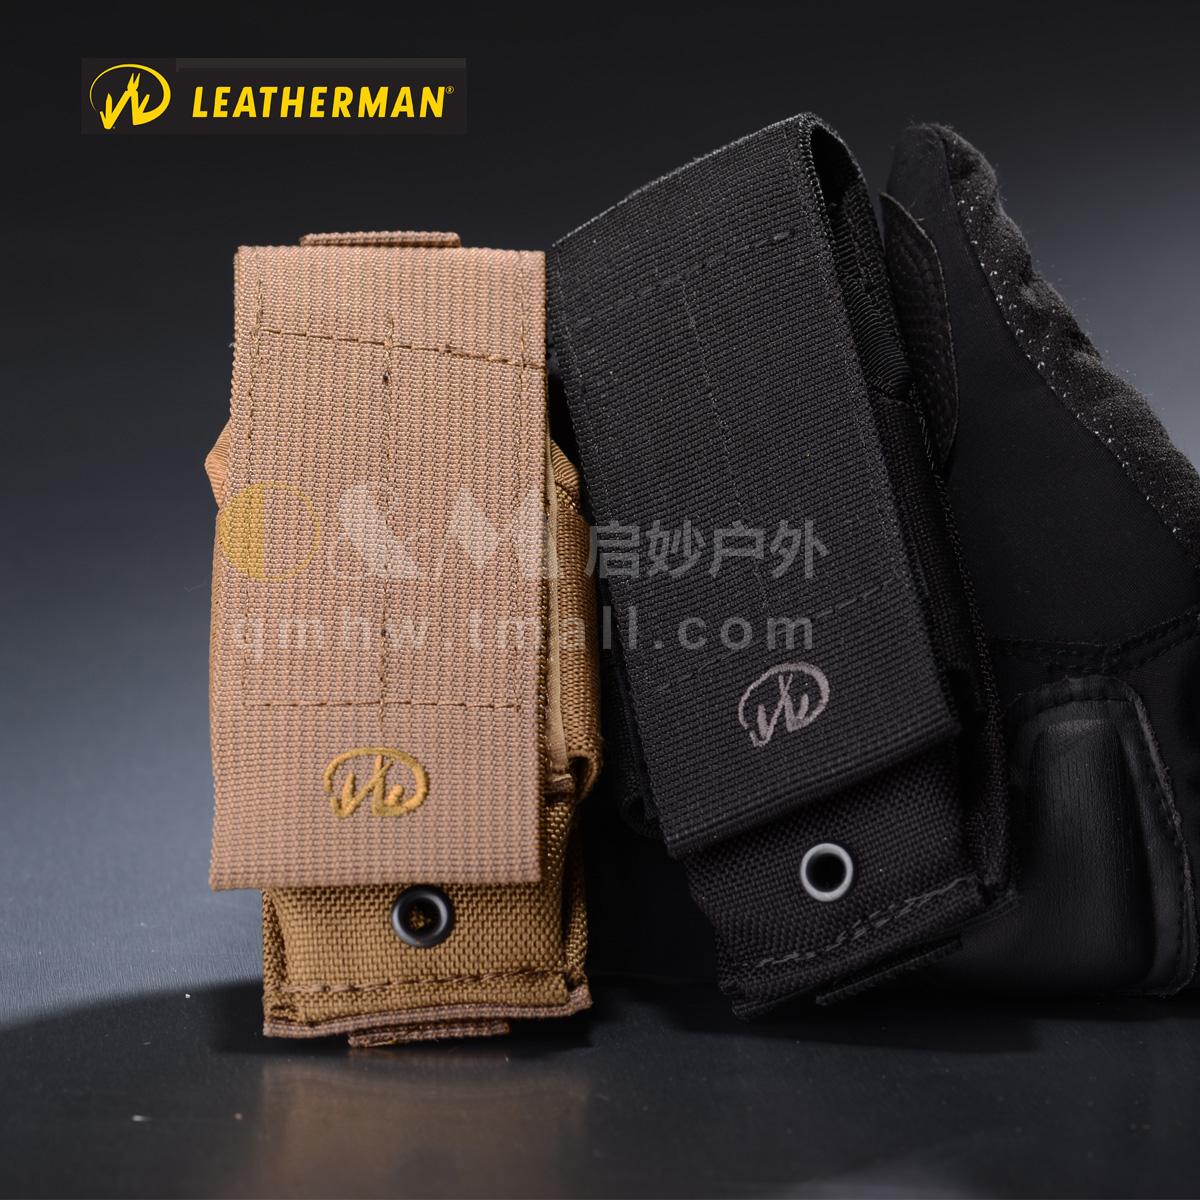 Leatherman美國萊澤曼 原廠工具鉗專配套子收納套 尼龍/皮質